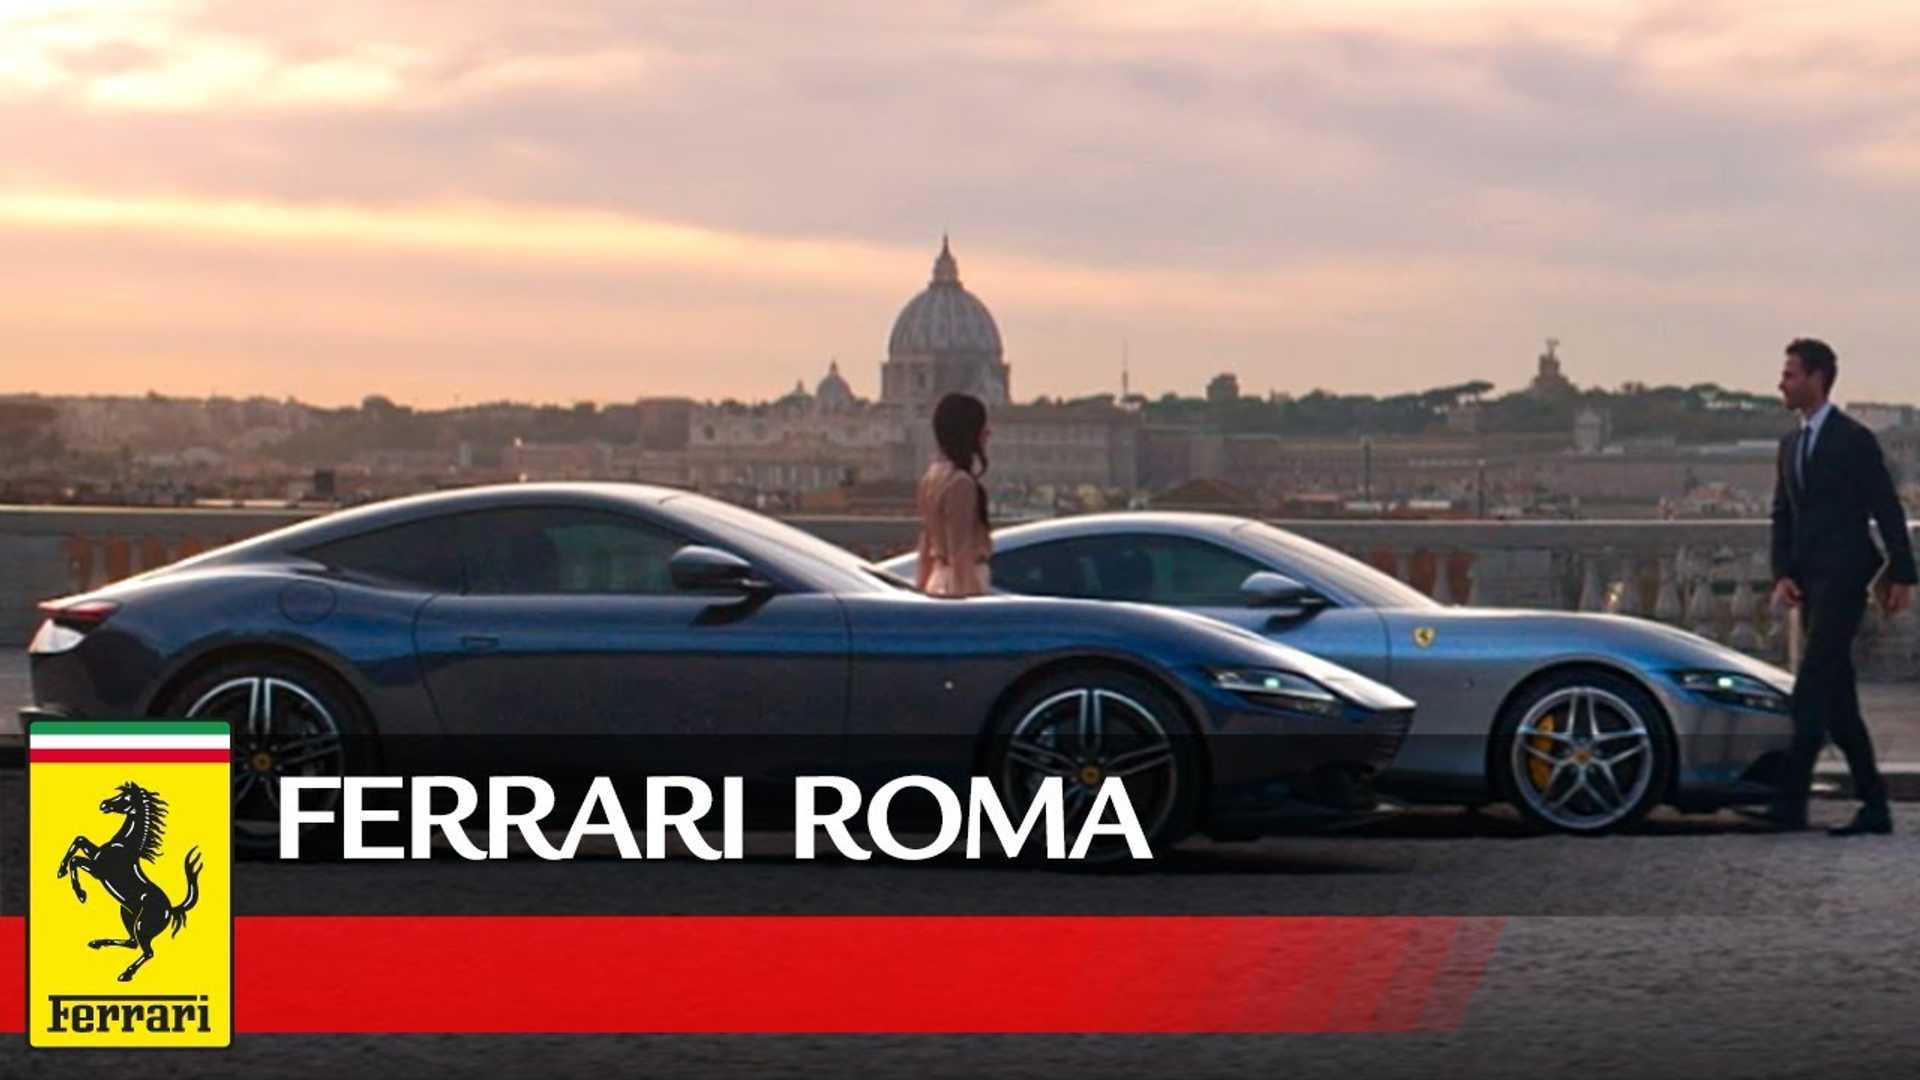 Ferrari Roma Wallpapers Wallpaper Cave